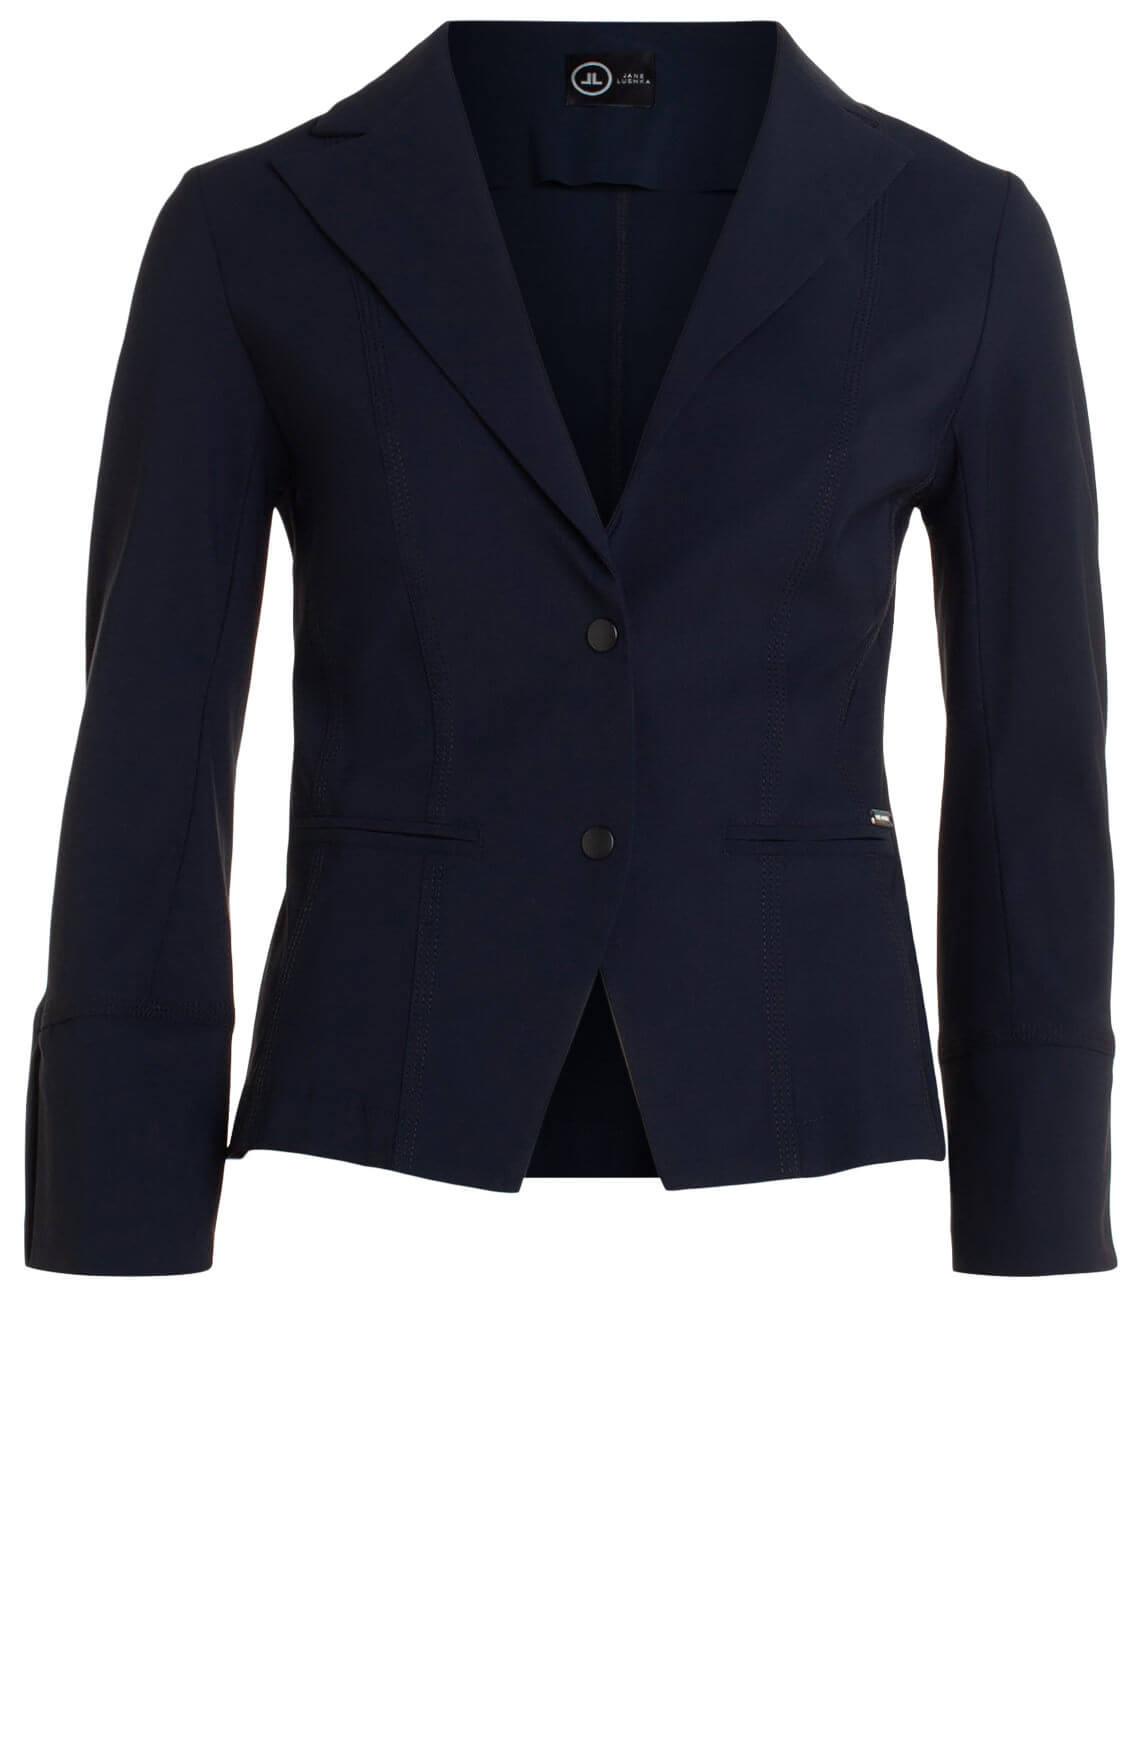 Jane Lushka Dames Blazer met strikdetail Blauw